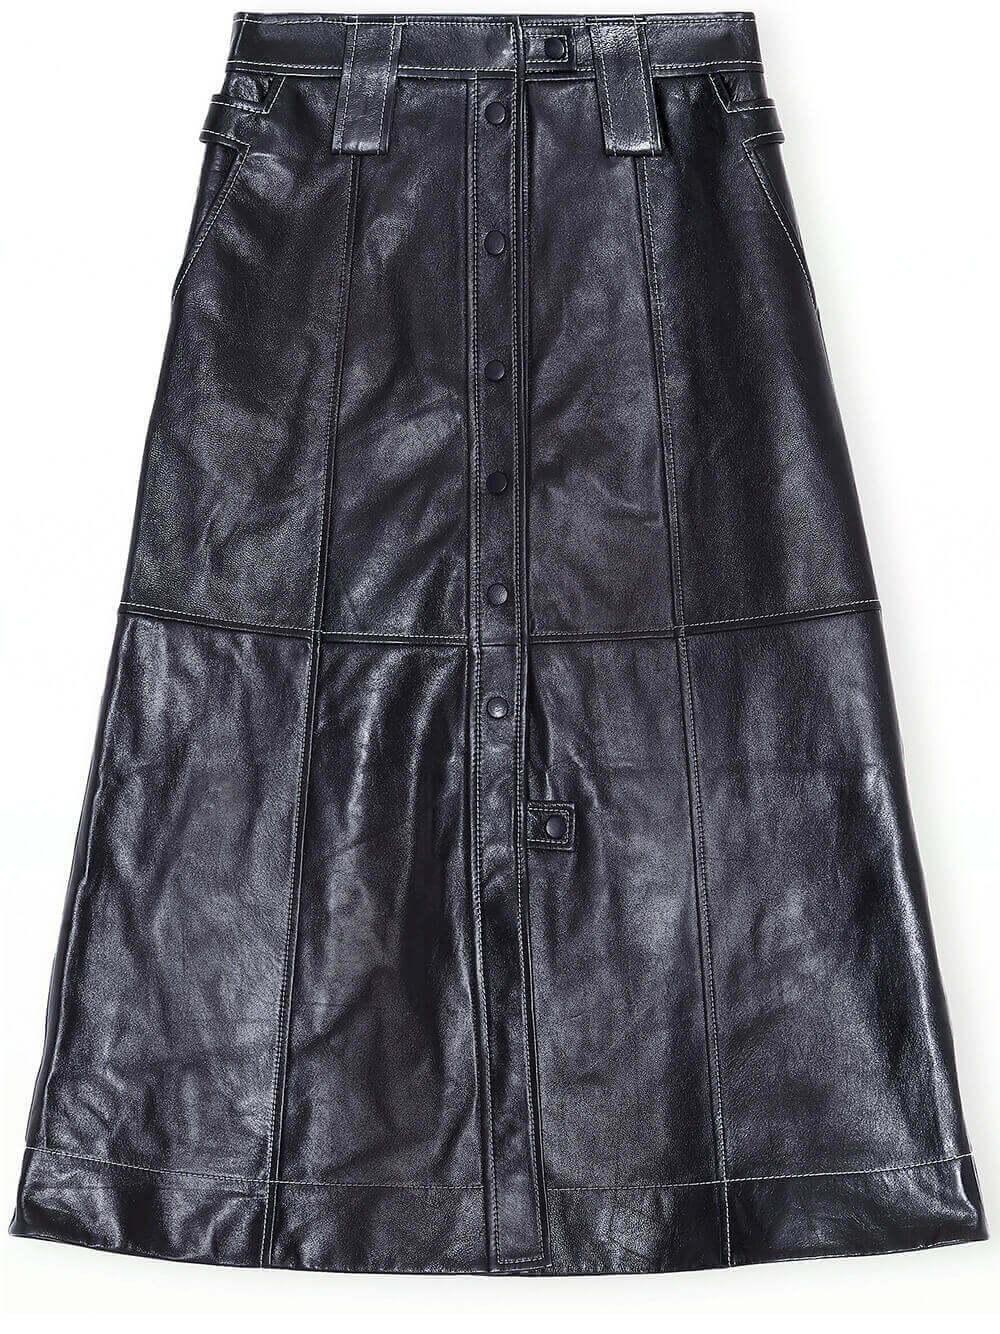 Lamb Leather Midi Skirt Item # F5199